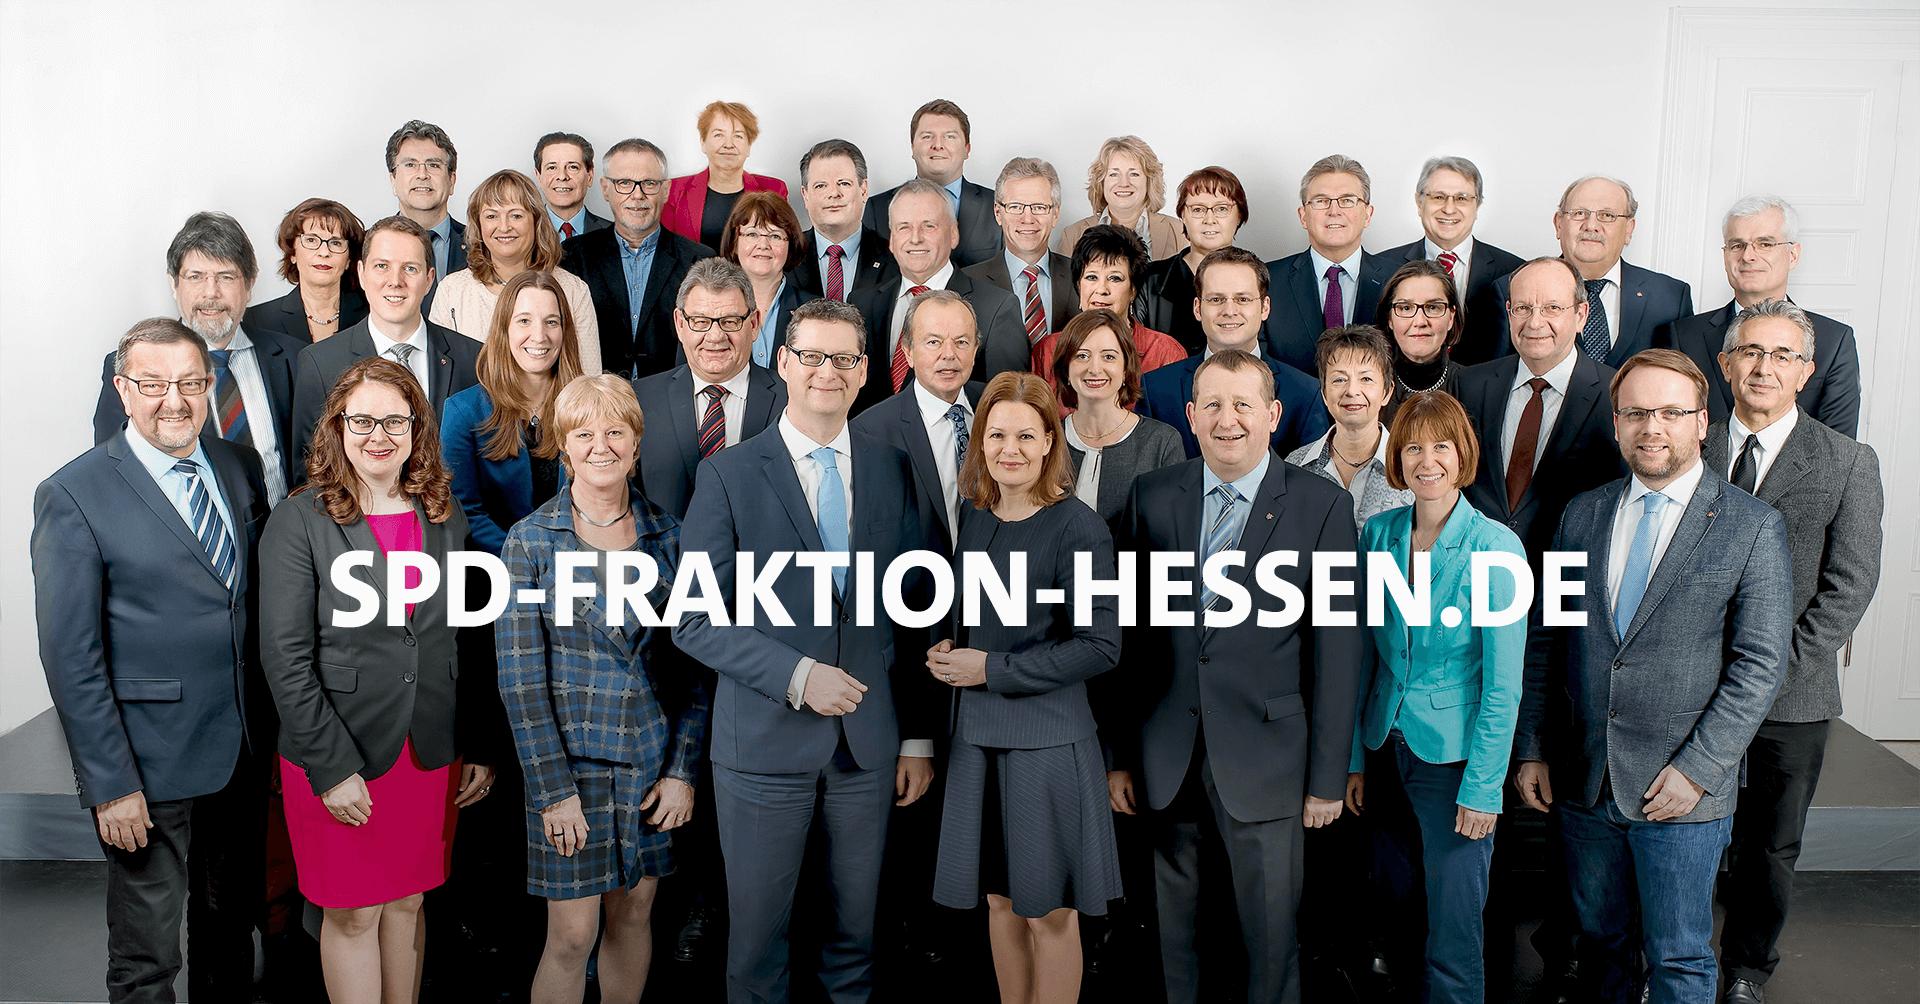 (c) Spd-fraktion-hessen.de